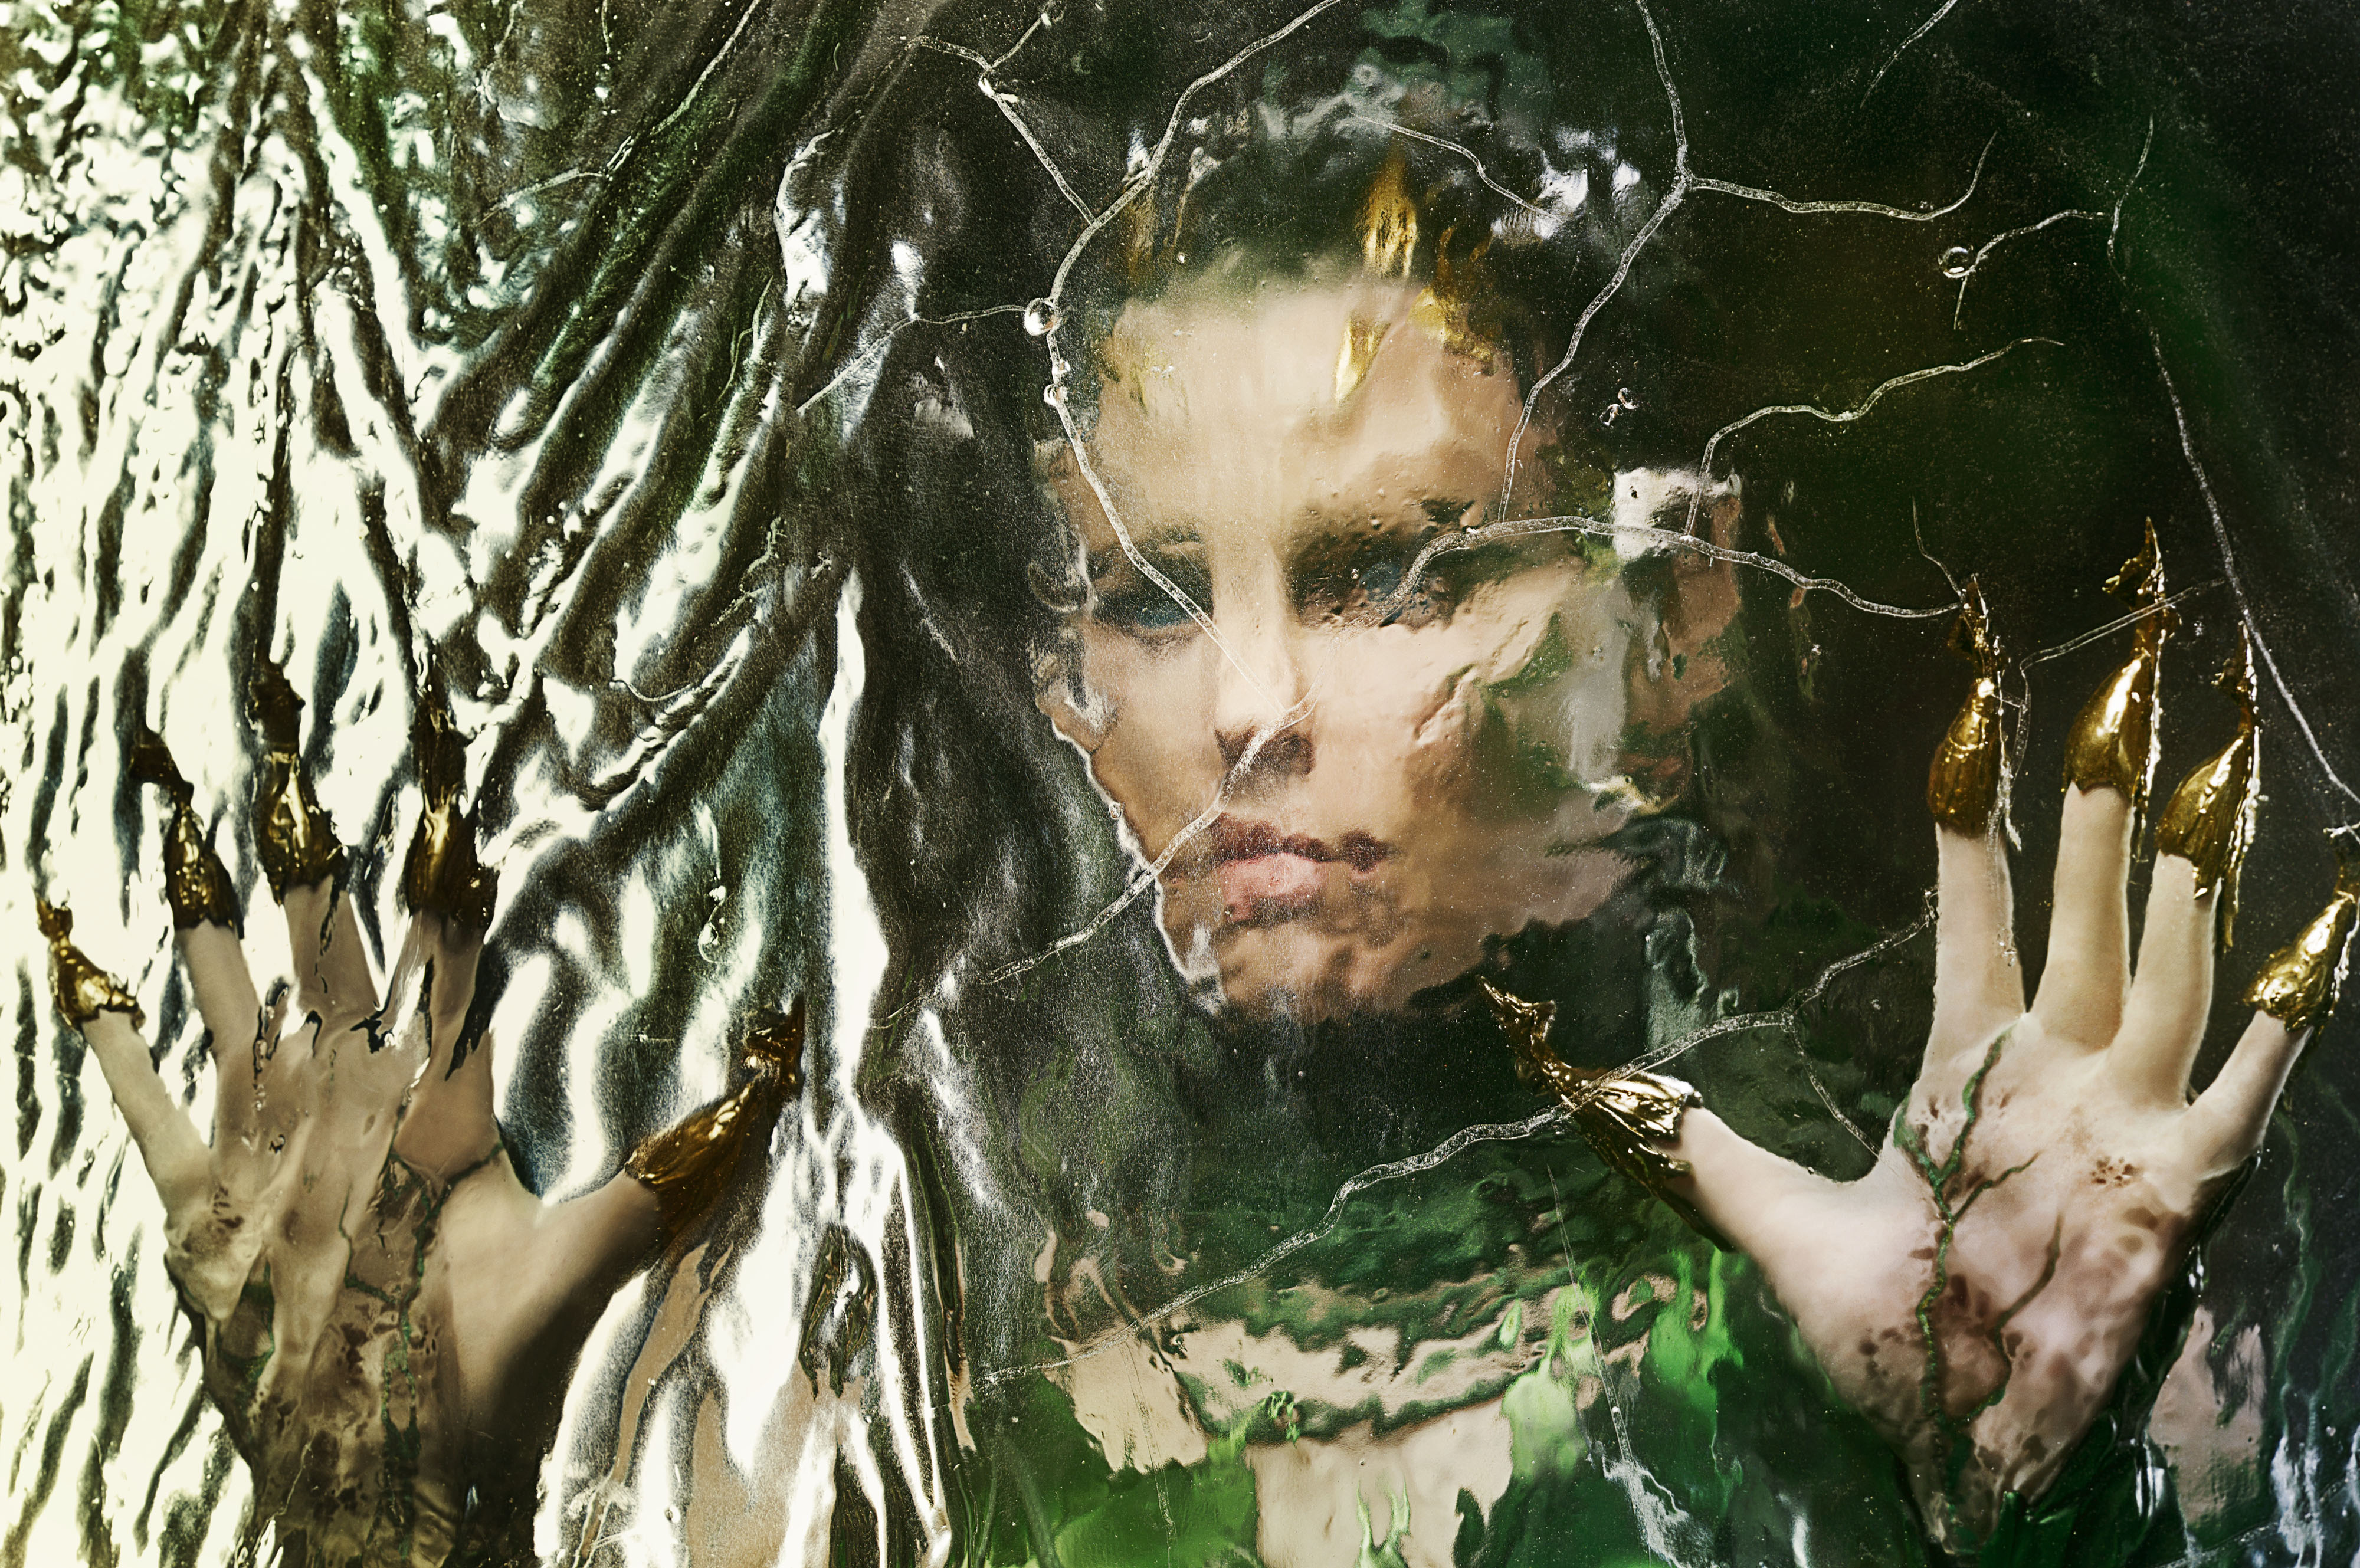 Rita Repulsa - l'extra-terrestre très humanoïde qui carbure à l'or et la destruction de toutes sortes de choses. Photo: Les Films Séville